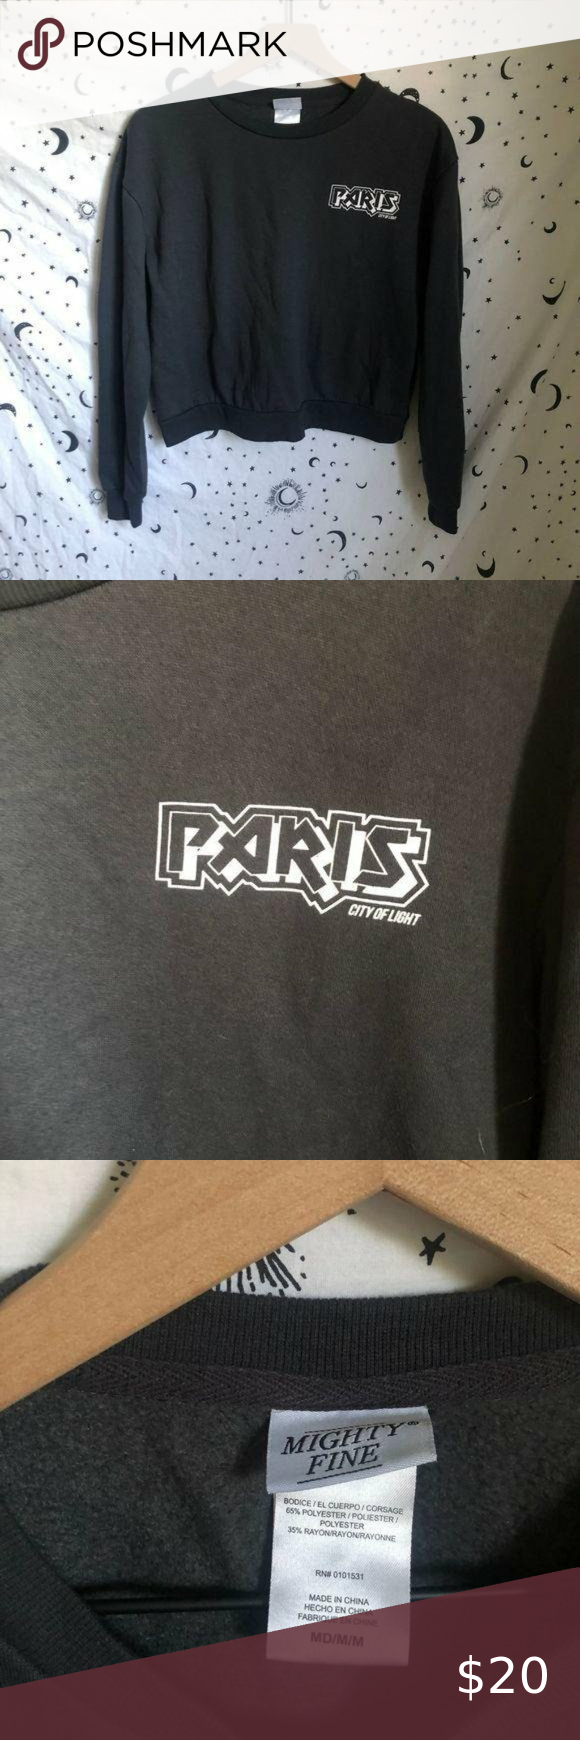 Paris Dark Gray Cropped Crewneck Sweatshirt Worn But In Perfect Condition Soft And Comfortable Fleece Linin Crew Neck Sweatshirt Cropped Crewneck Sweatshirts [ 1740 x 580 Pixel ]